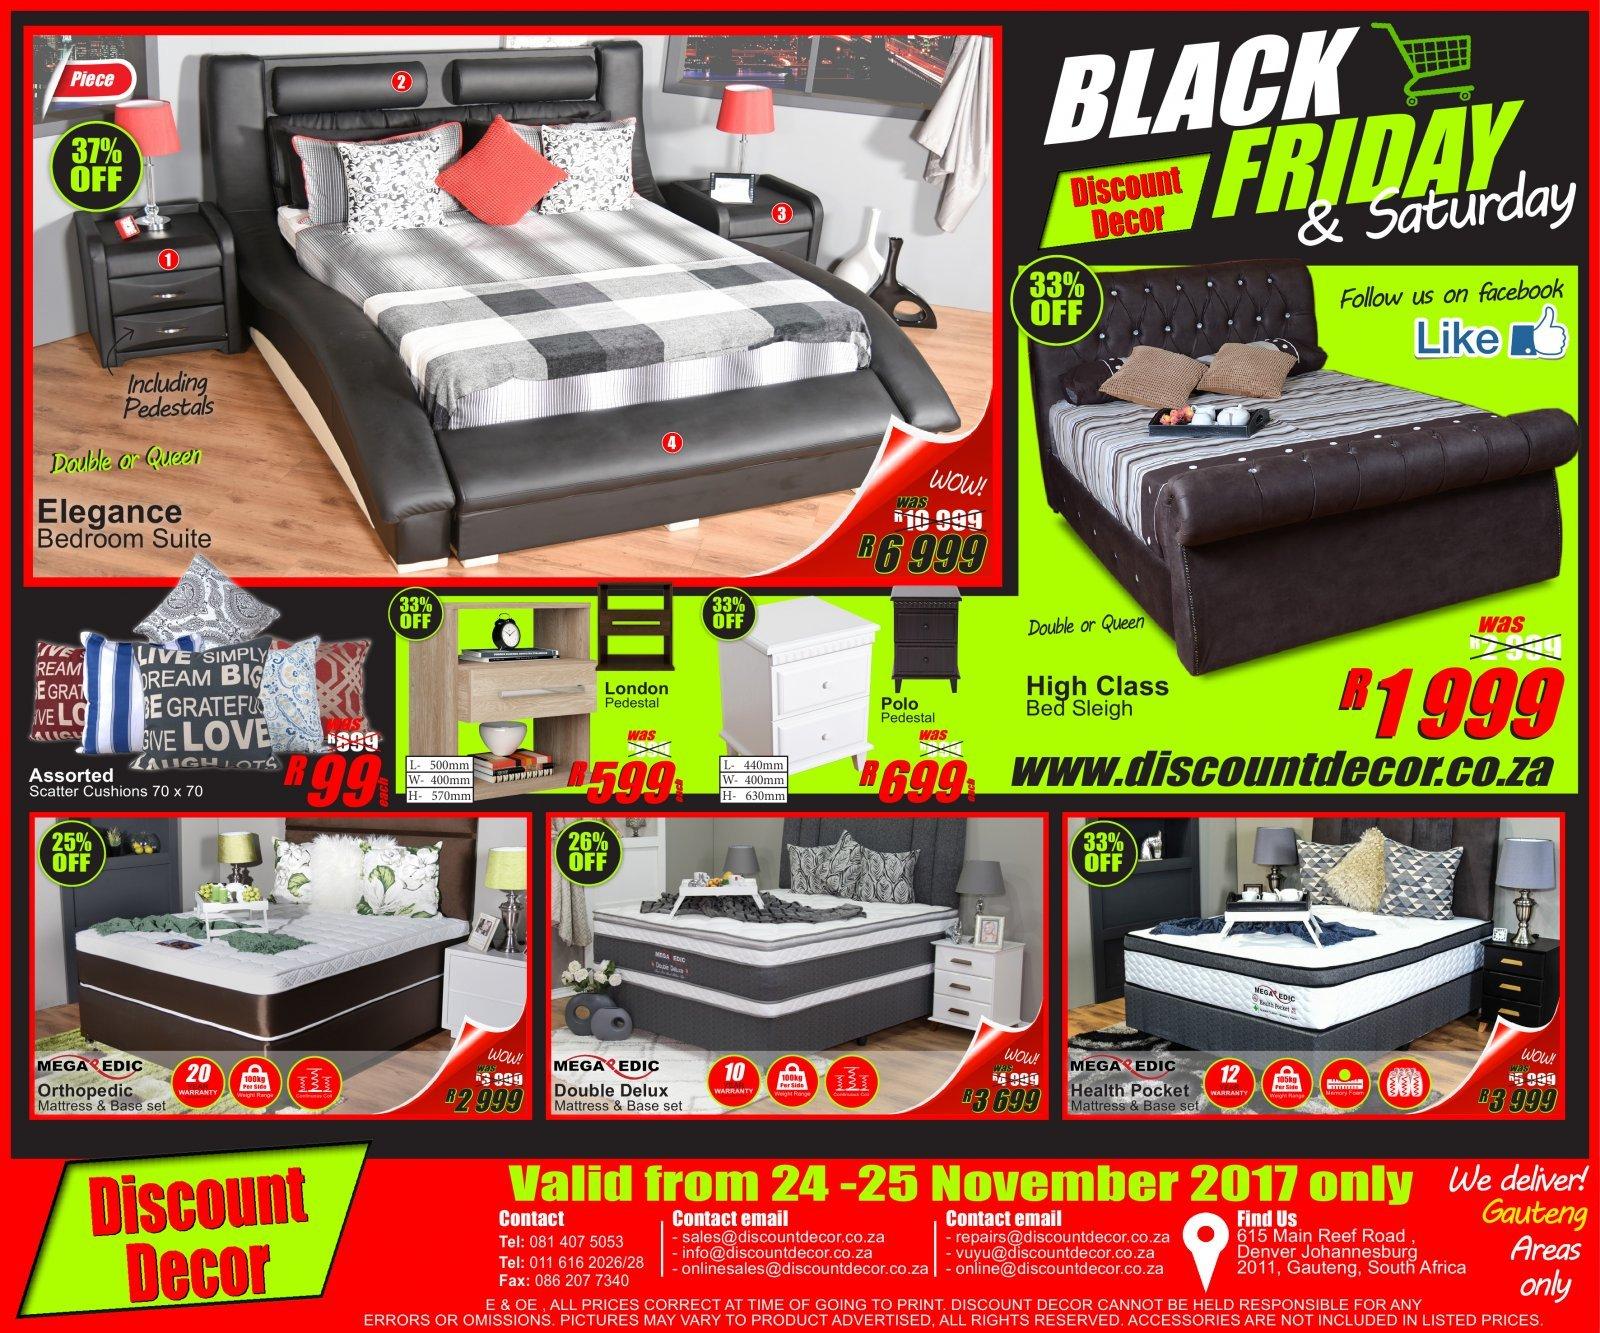 Blackfriday discount decor black friday deals prices for Decor discount